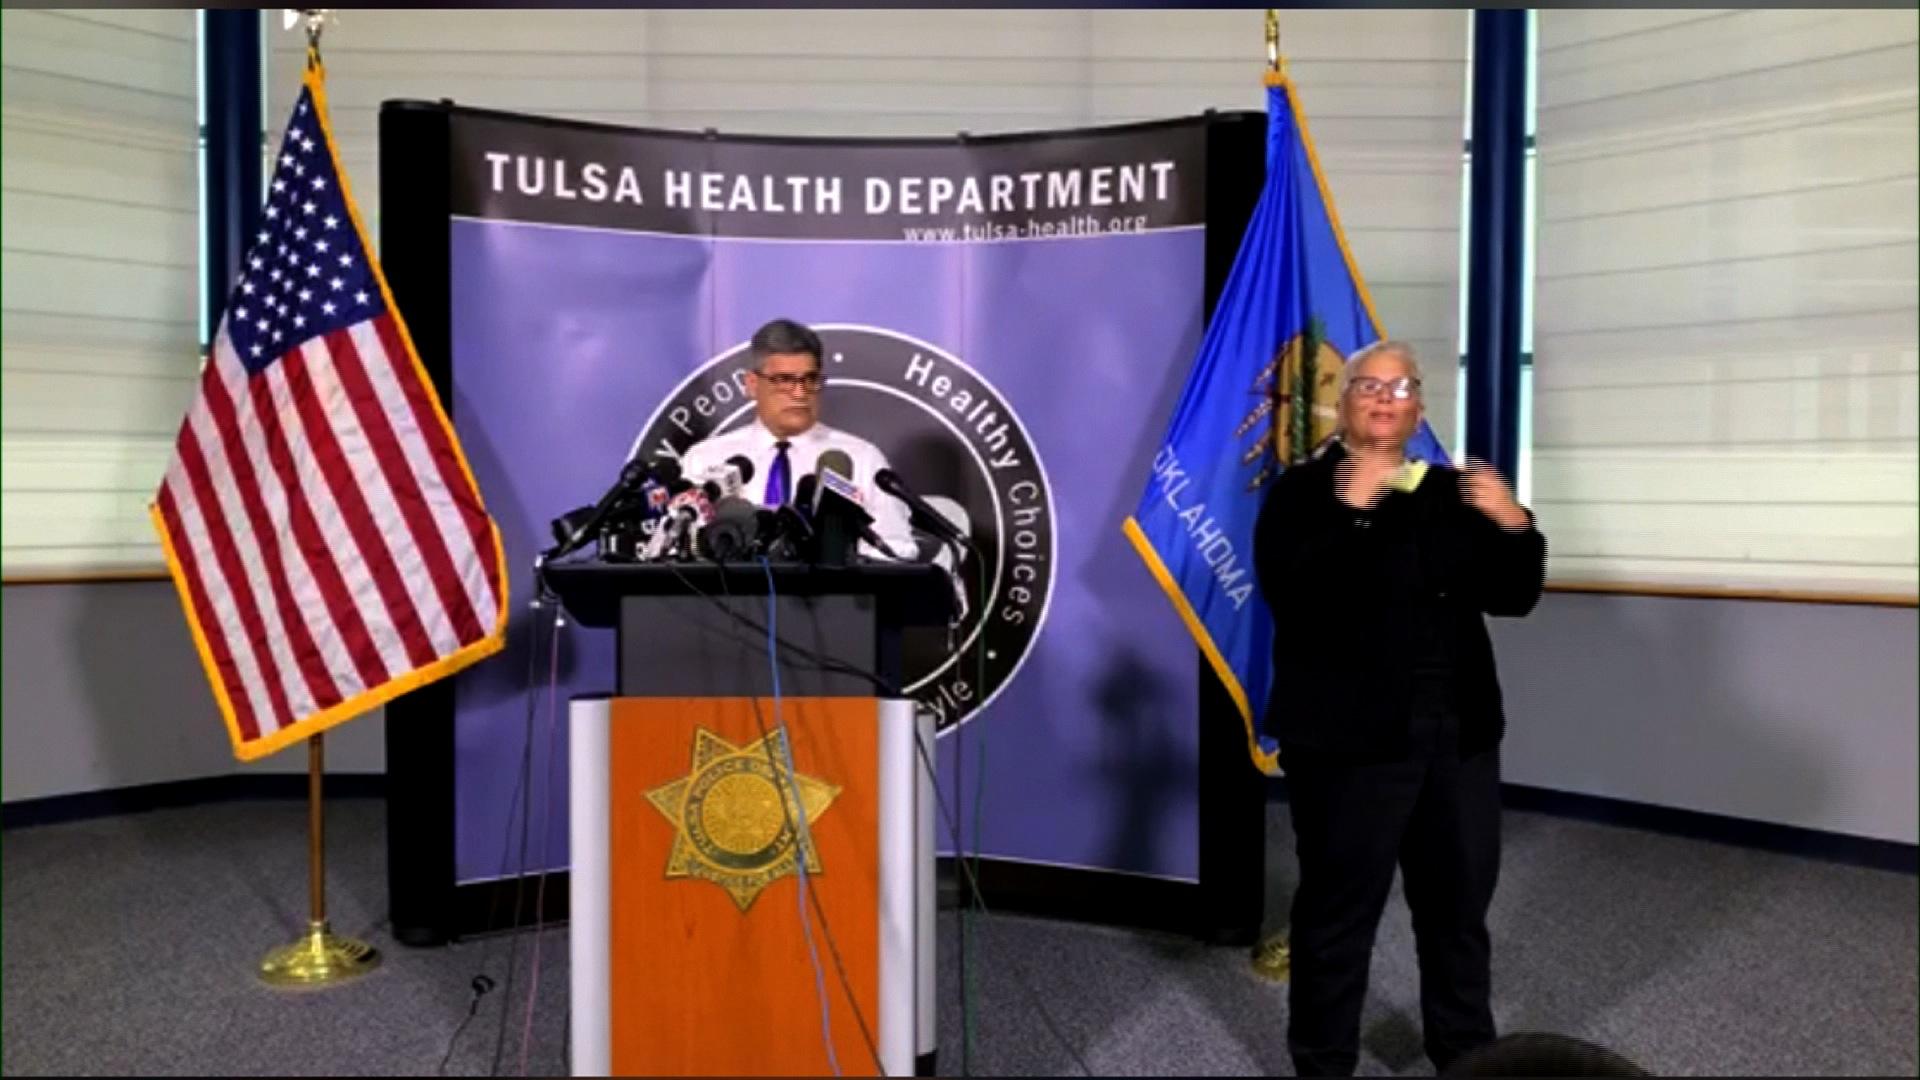 City of Tulsa Facebook